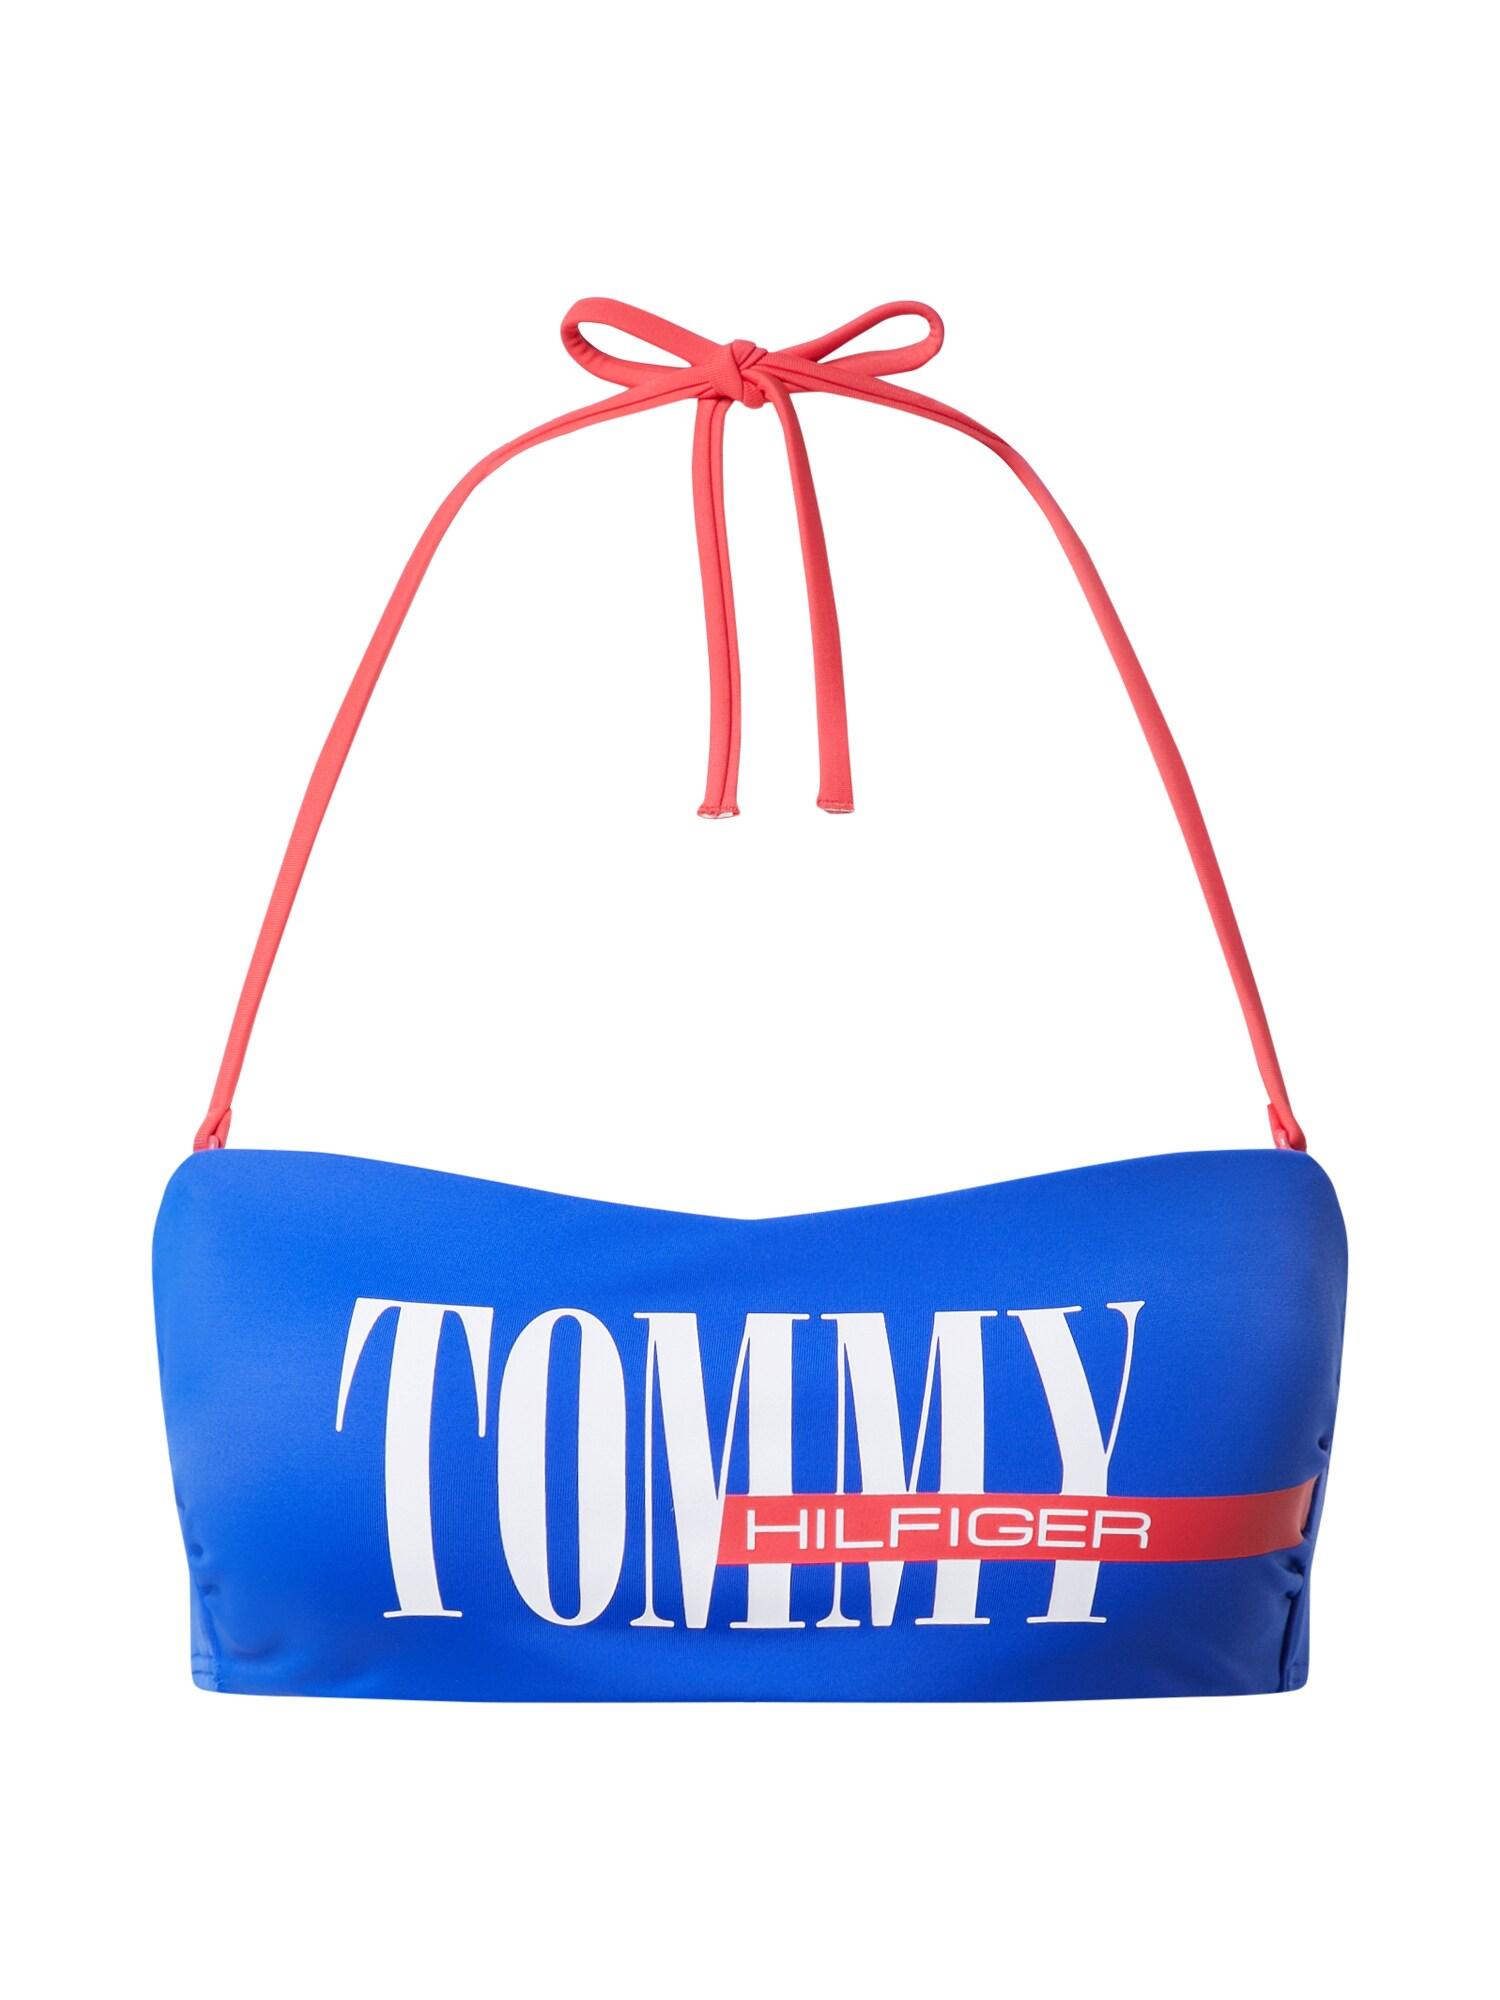 "Tommy Hilfiger Underwear Bikinio viršutinė dalis balta / raudona / sodri mėlyna (""karališka"")"